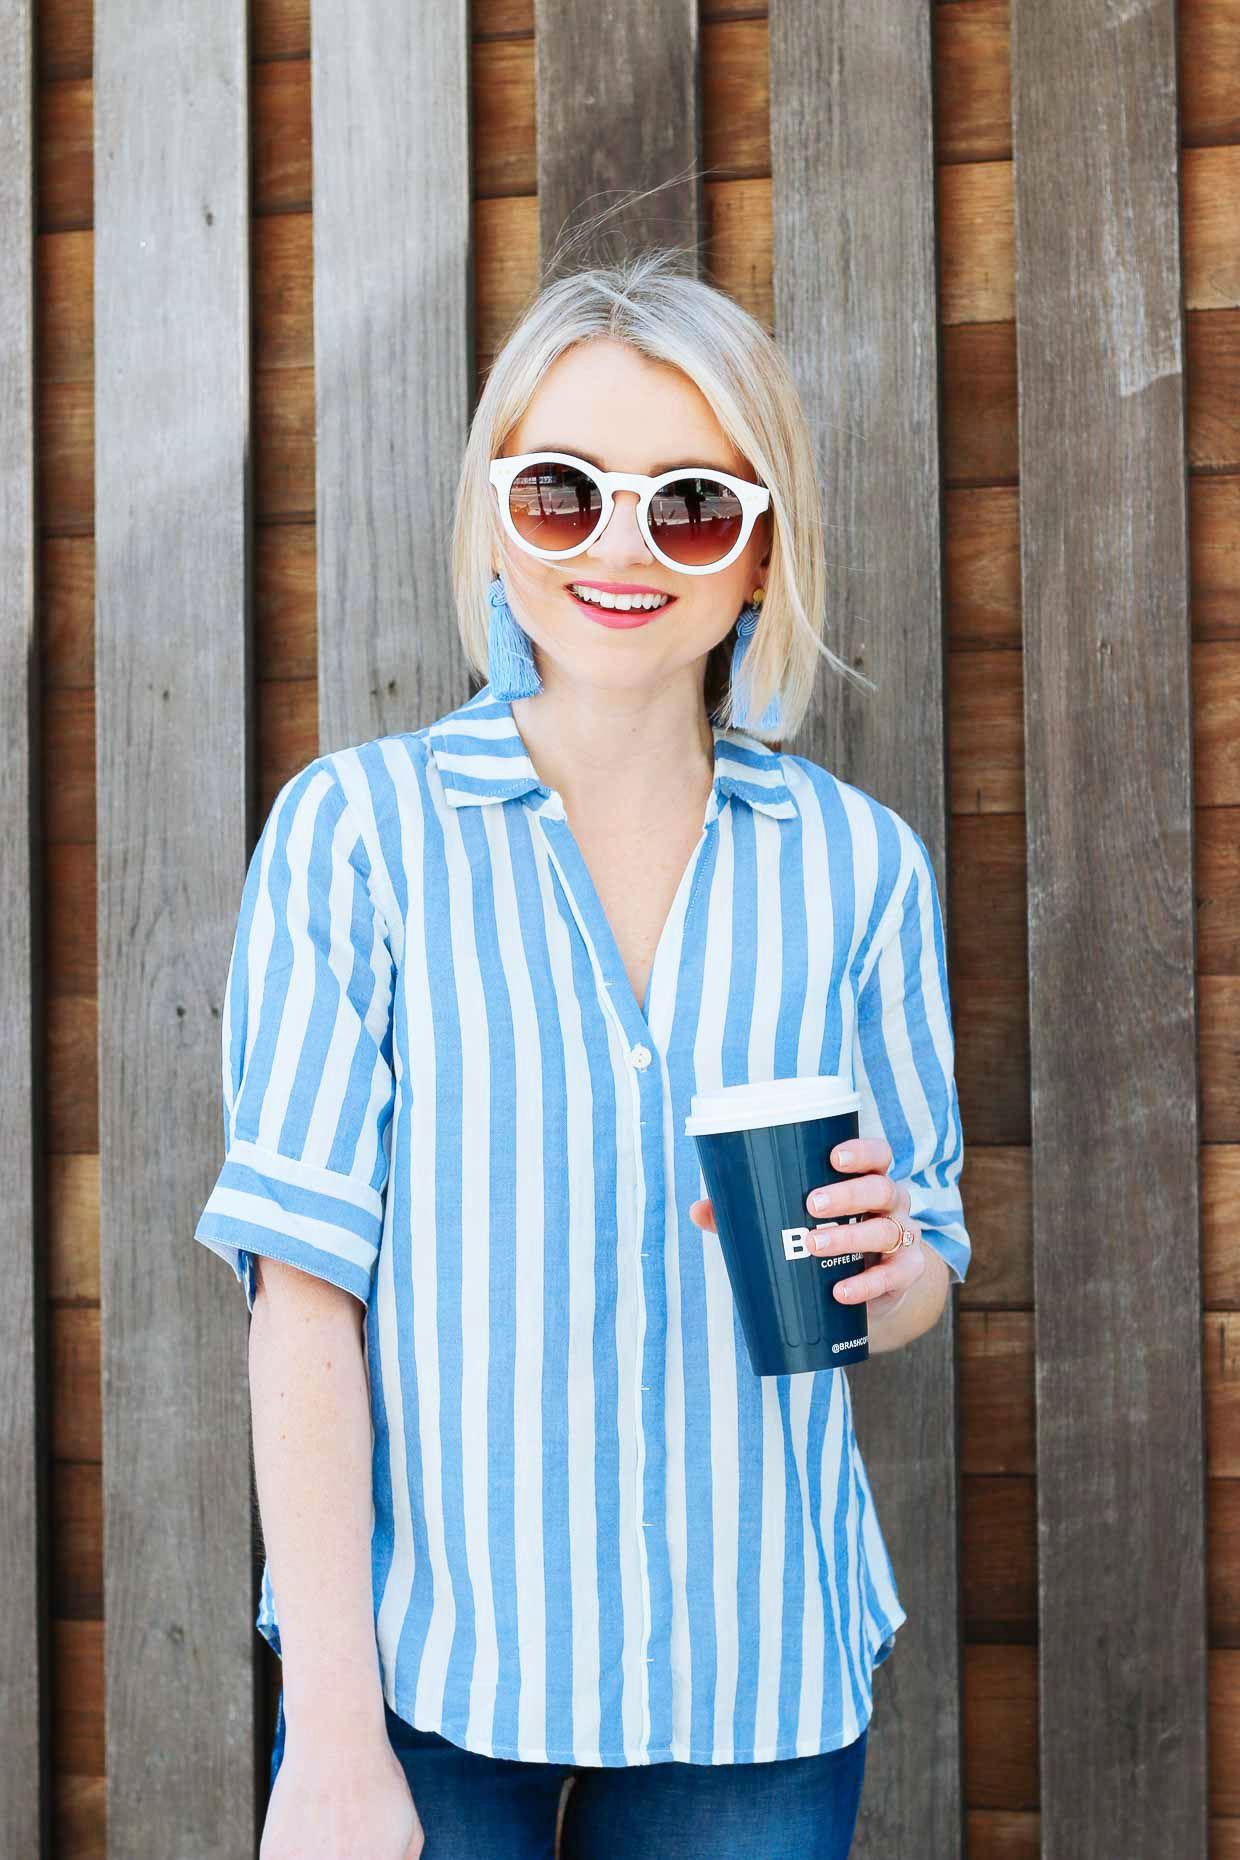 fa18cd040 J.Crew Blue Stripe Short Sleeve Button Up Shirt - Poor Little It Girl